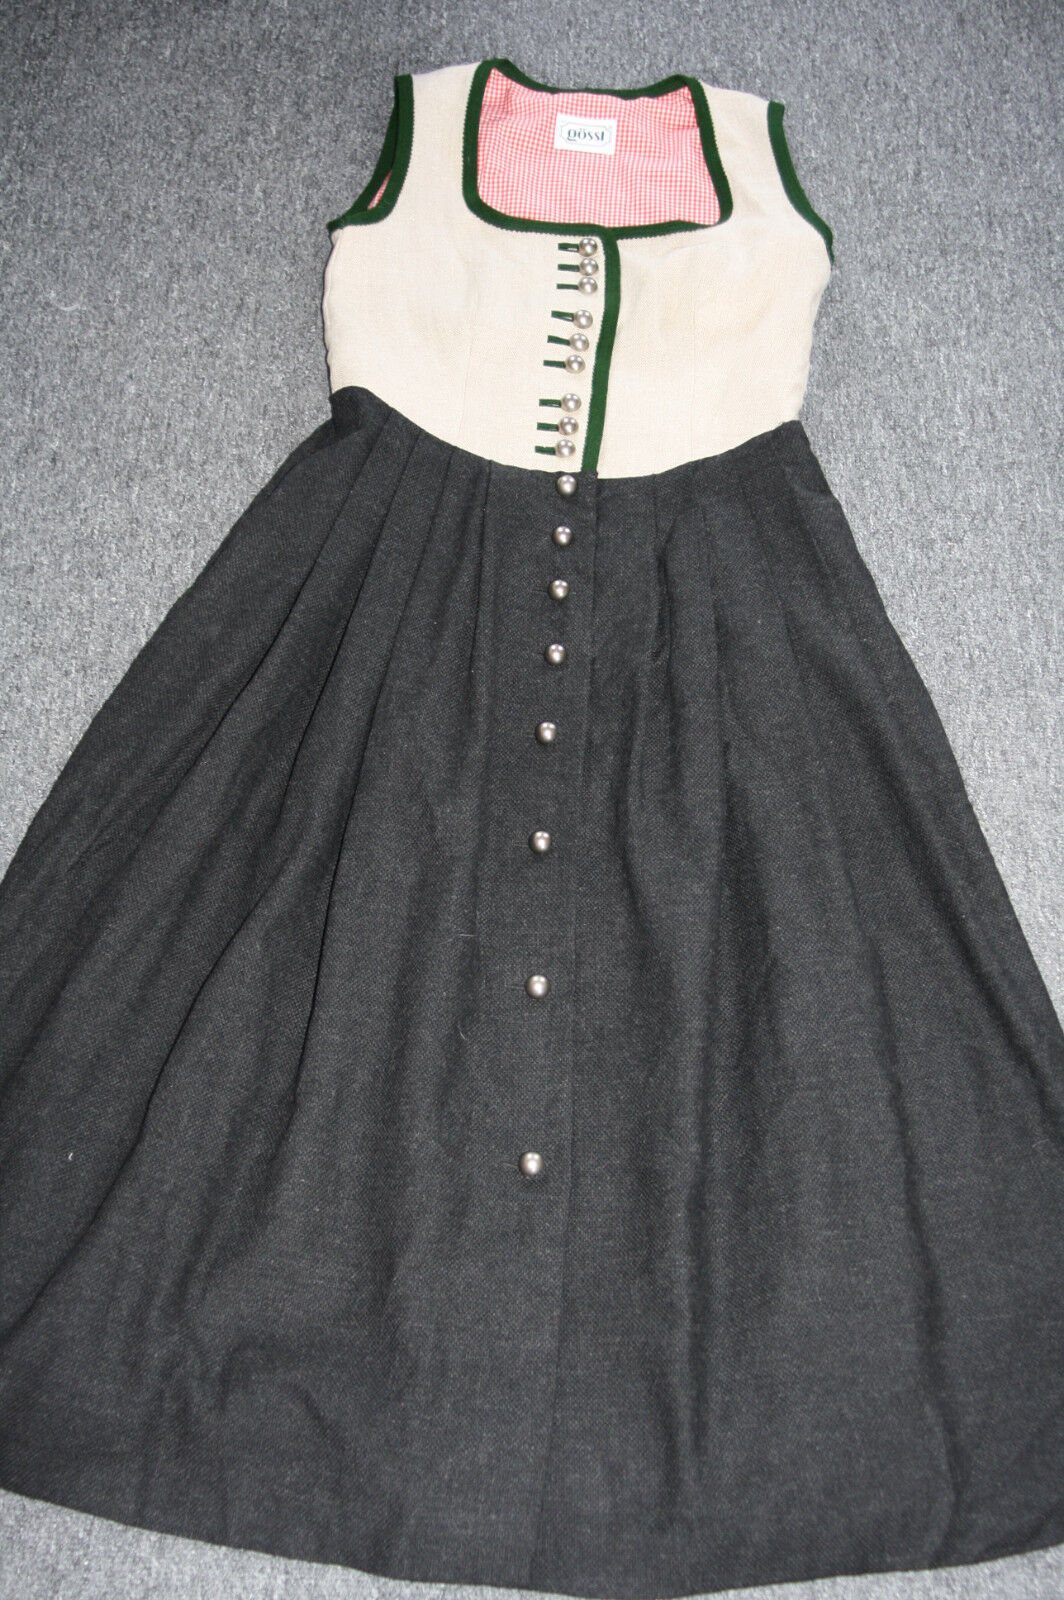 Kl4950  @ bávara @ país casa bávara @ gössl @ lino @ Trachten vestido @ 40  tienda de ventas outlet